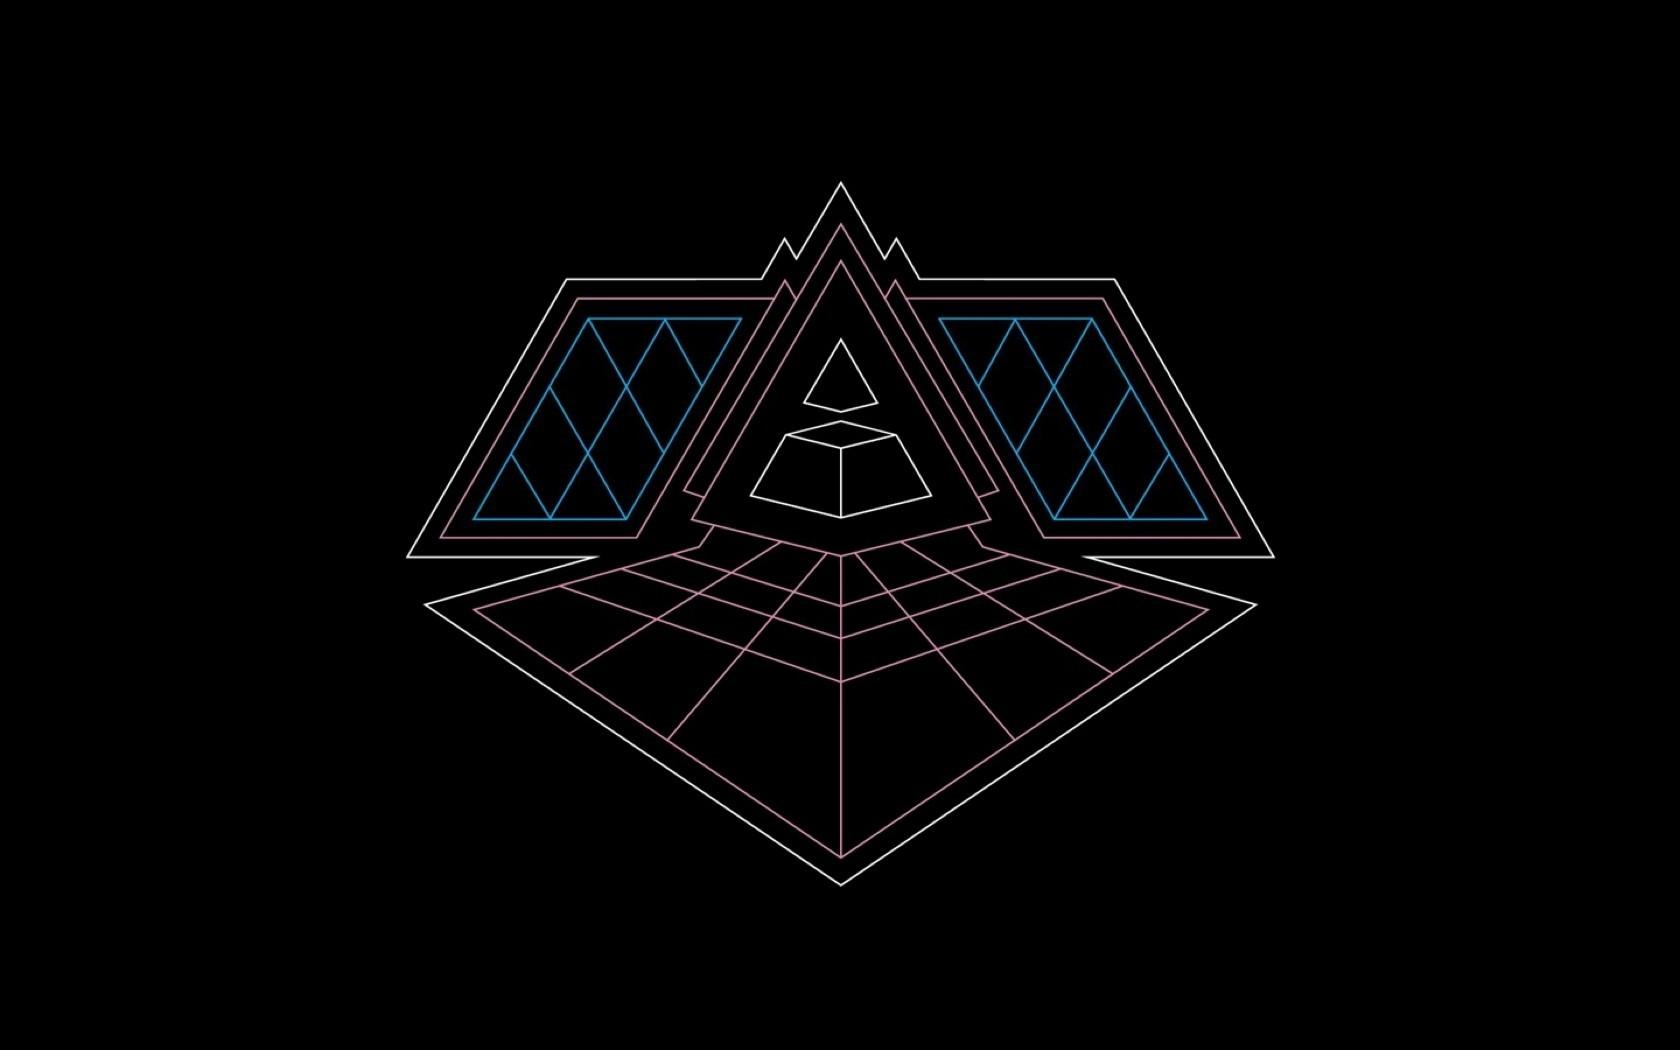 Wallpaper Illustration Logo Symmetry Triangle Pattern Circle Daft Punk Shape Design Line Font 1680x1050 Kingbailey 167016 Hd Wallpapers Wallhere